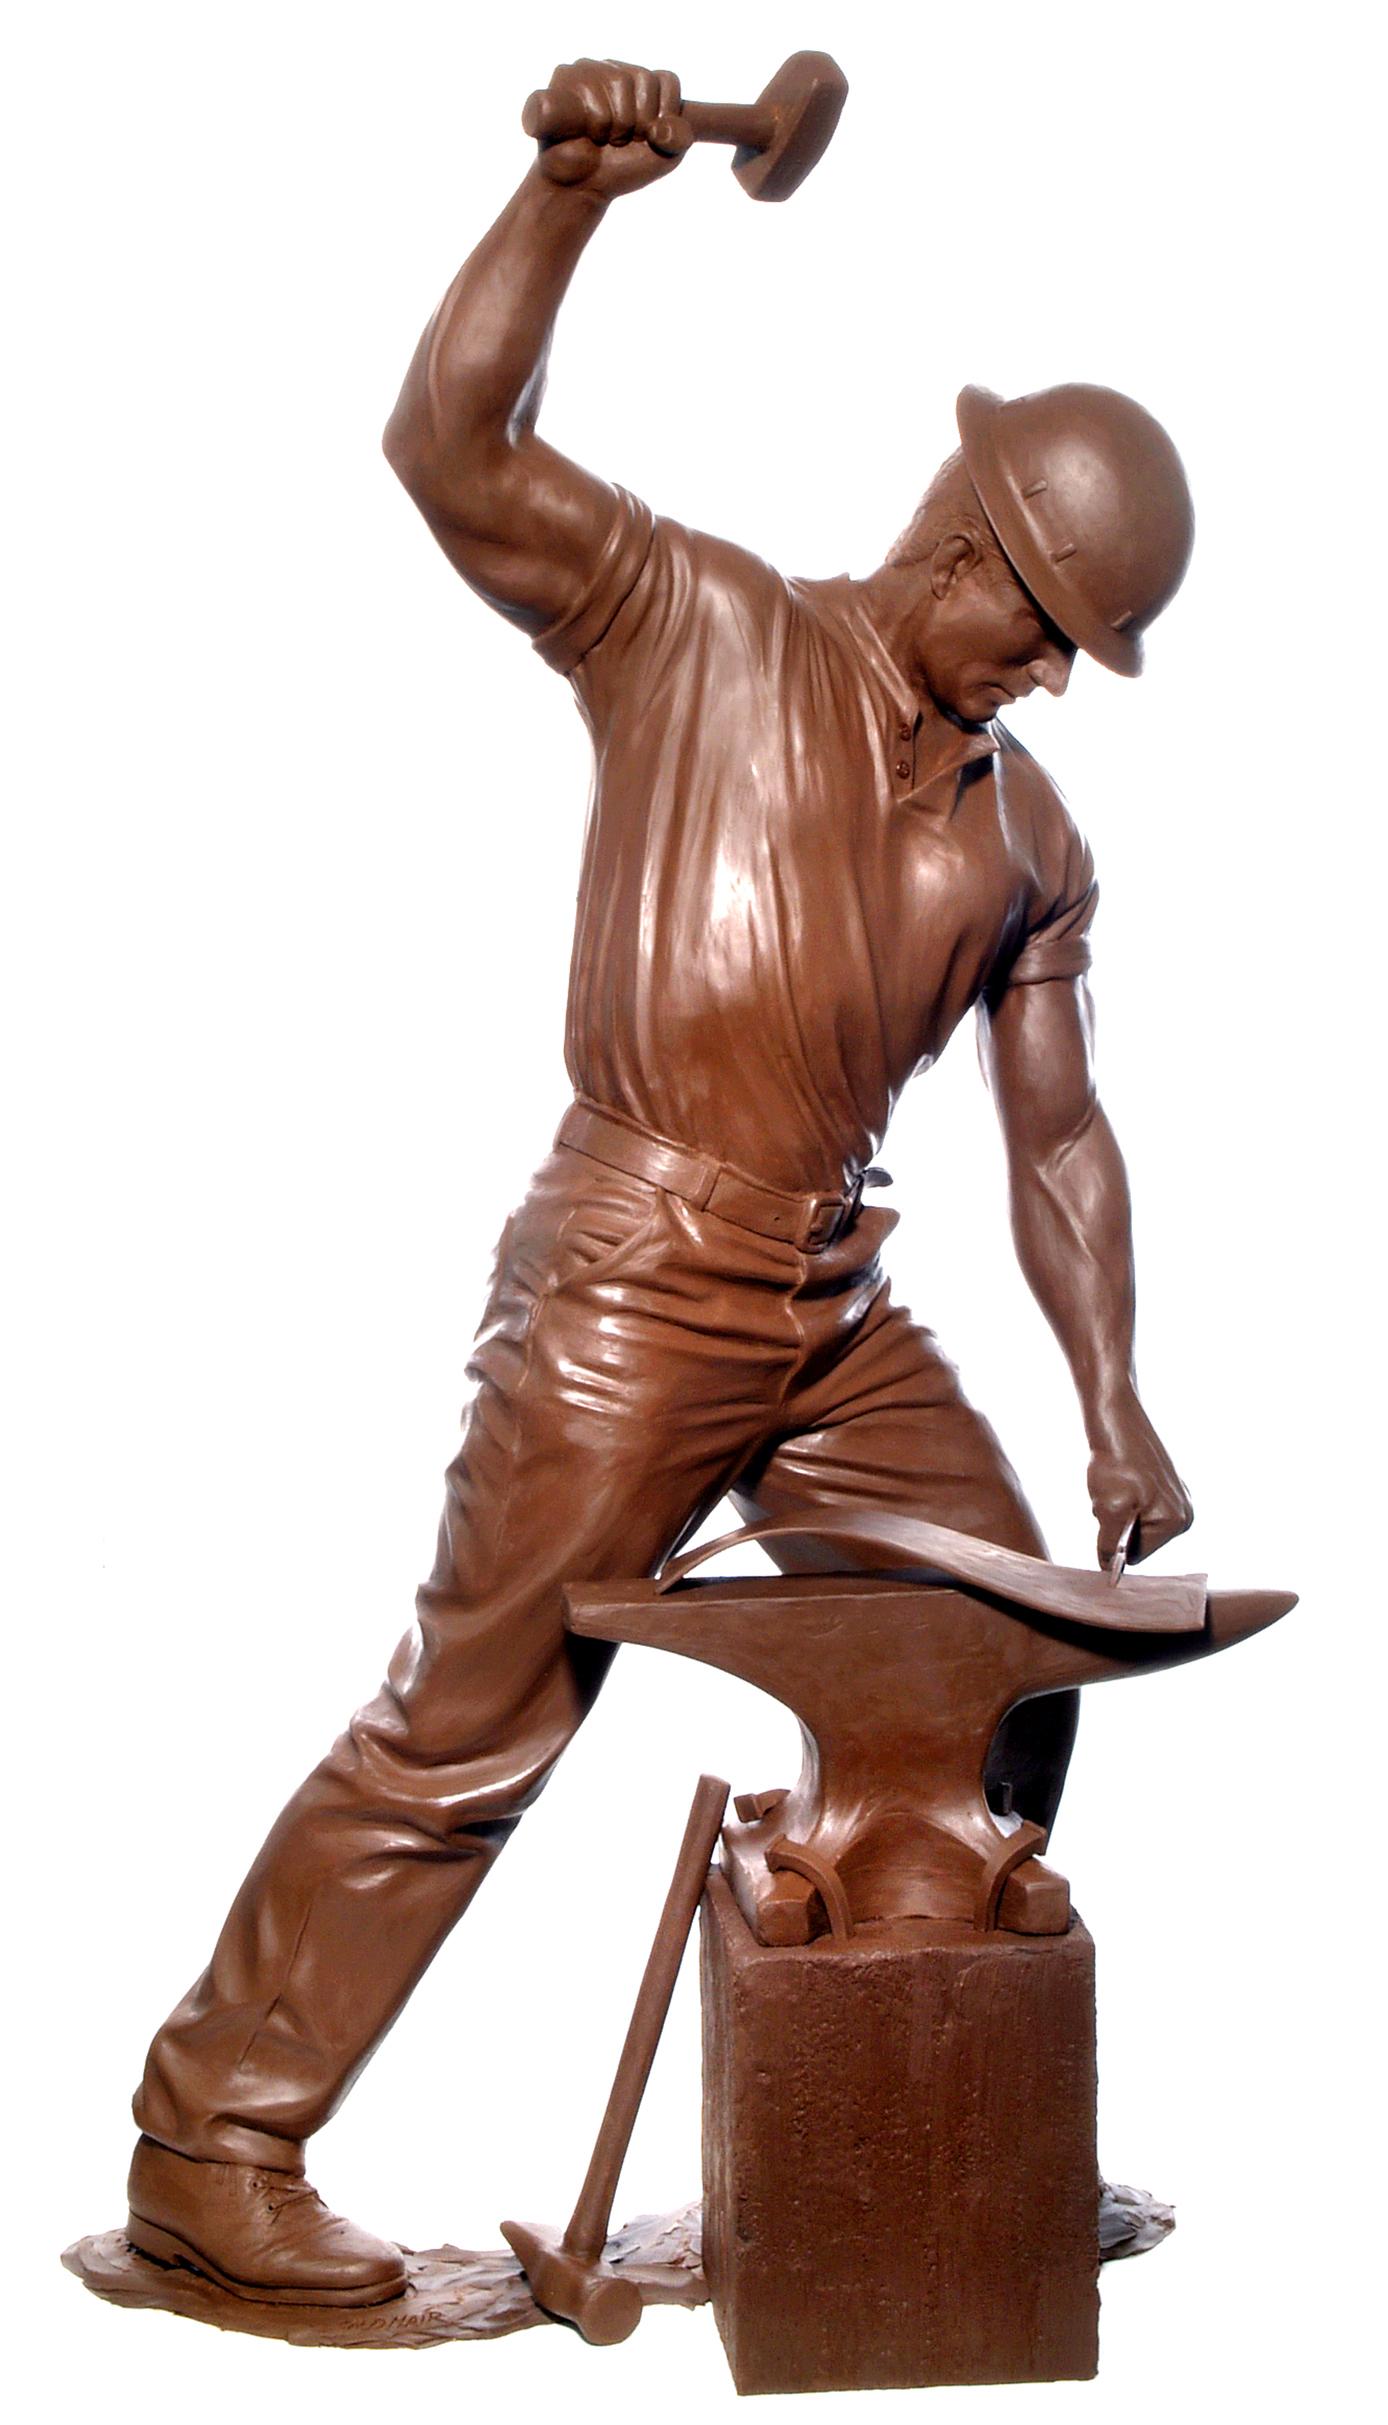 http://www.purdue.edu/uns/images/+2005/boilermaker-statue.jpg